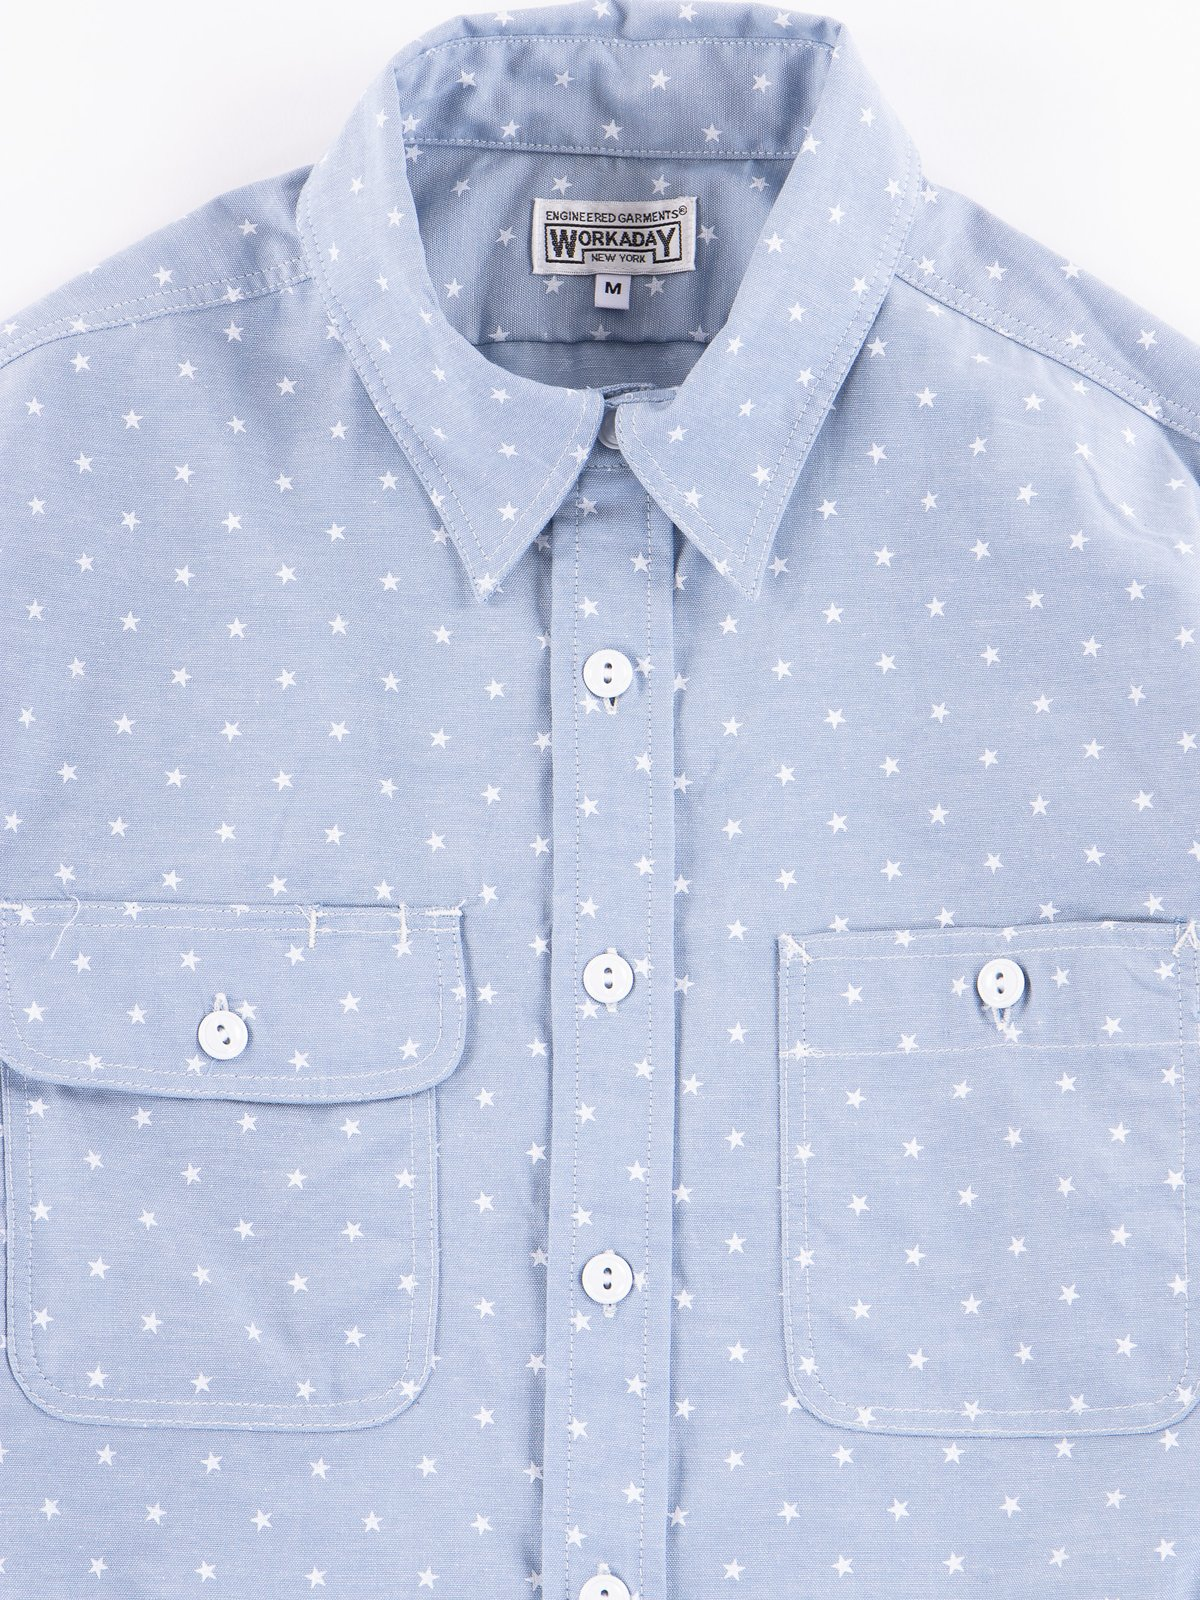 Light Blue Star Chambray Utility Shirt - Image 2